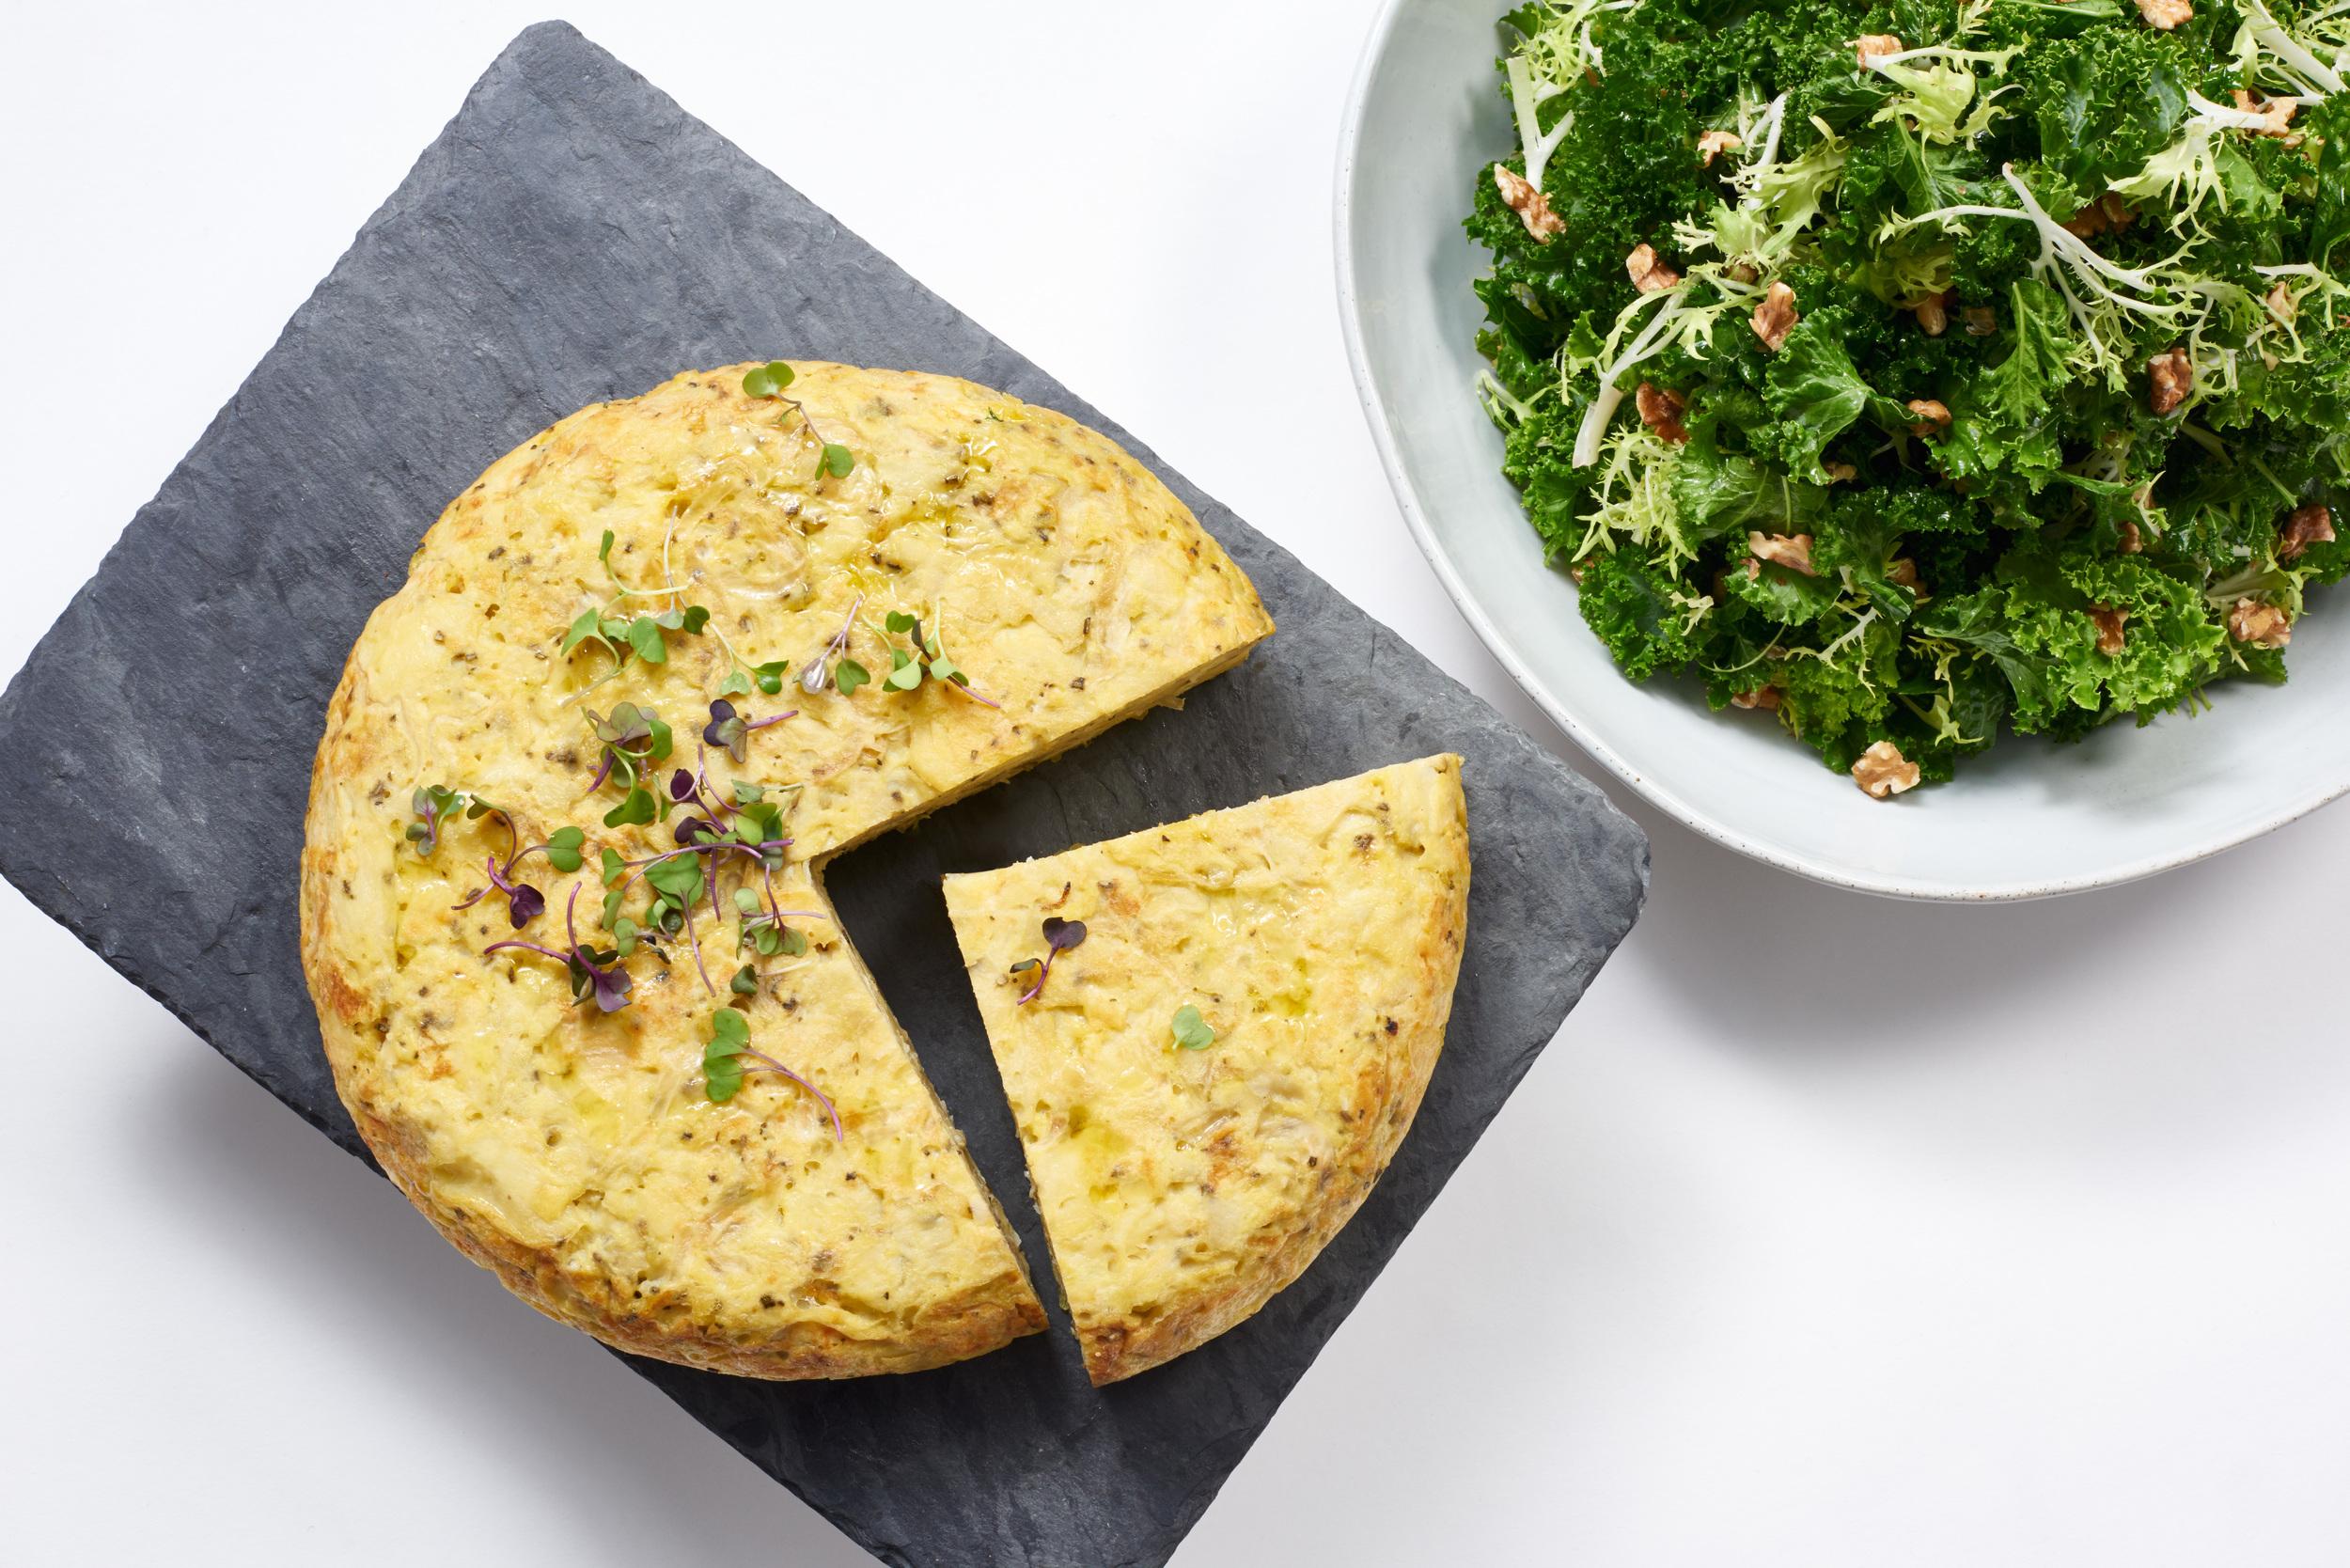 Tortilla española + kale frisee salad.